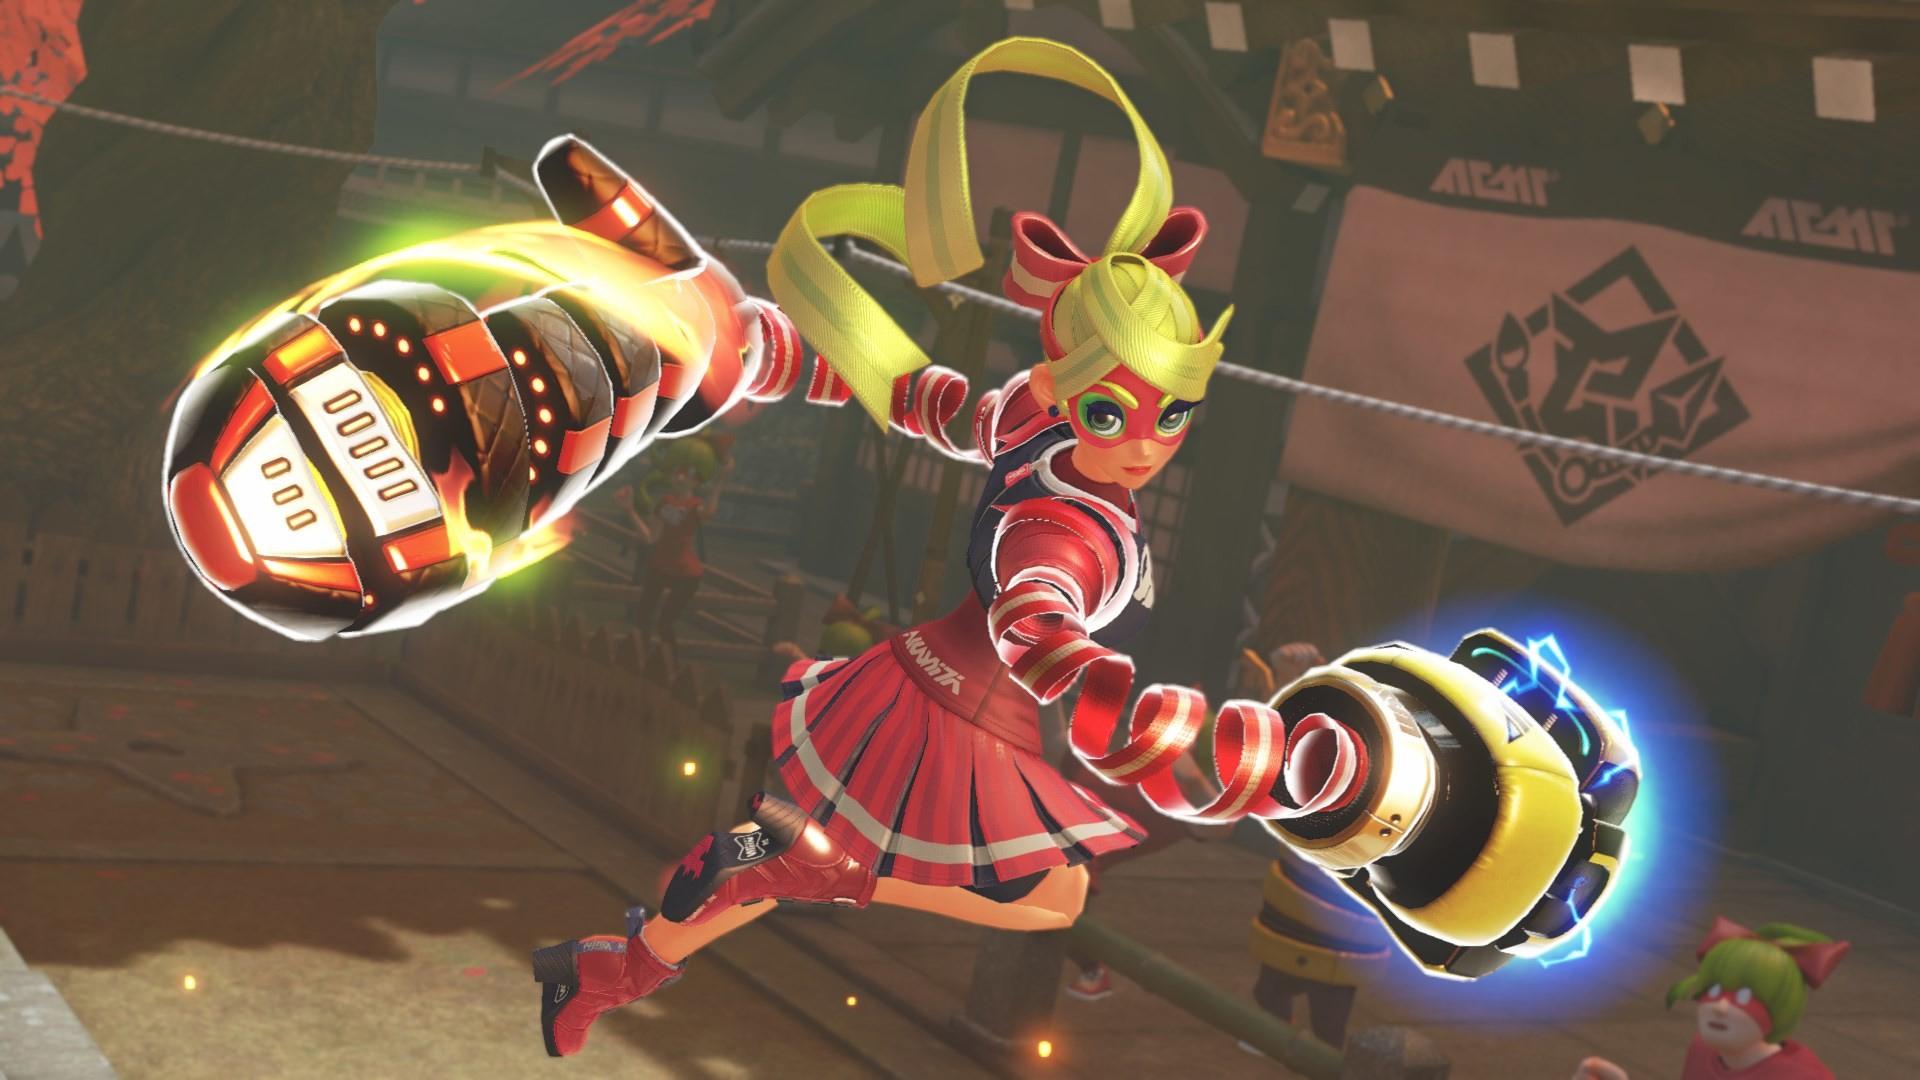 Meet Nintendo's core cast fighters 426270-h1.jpg